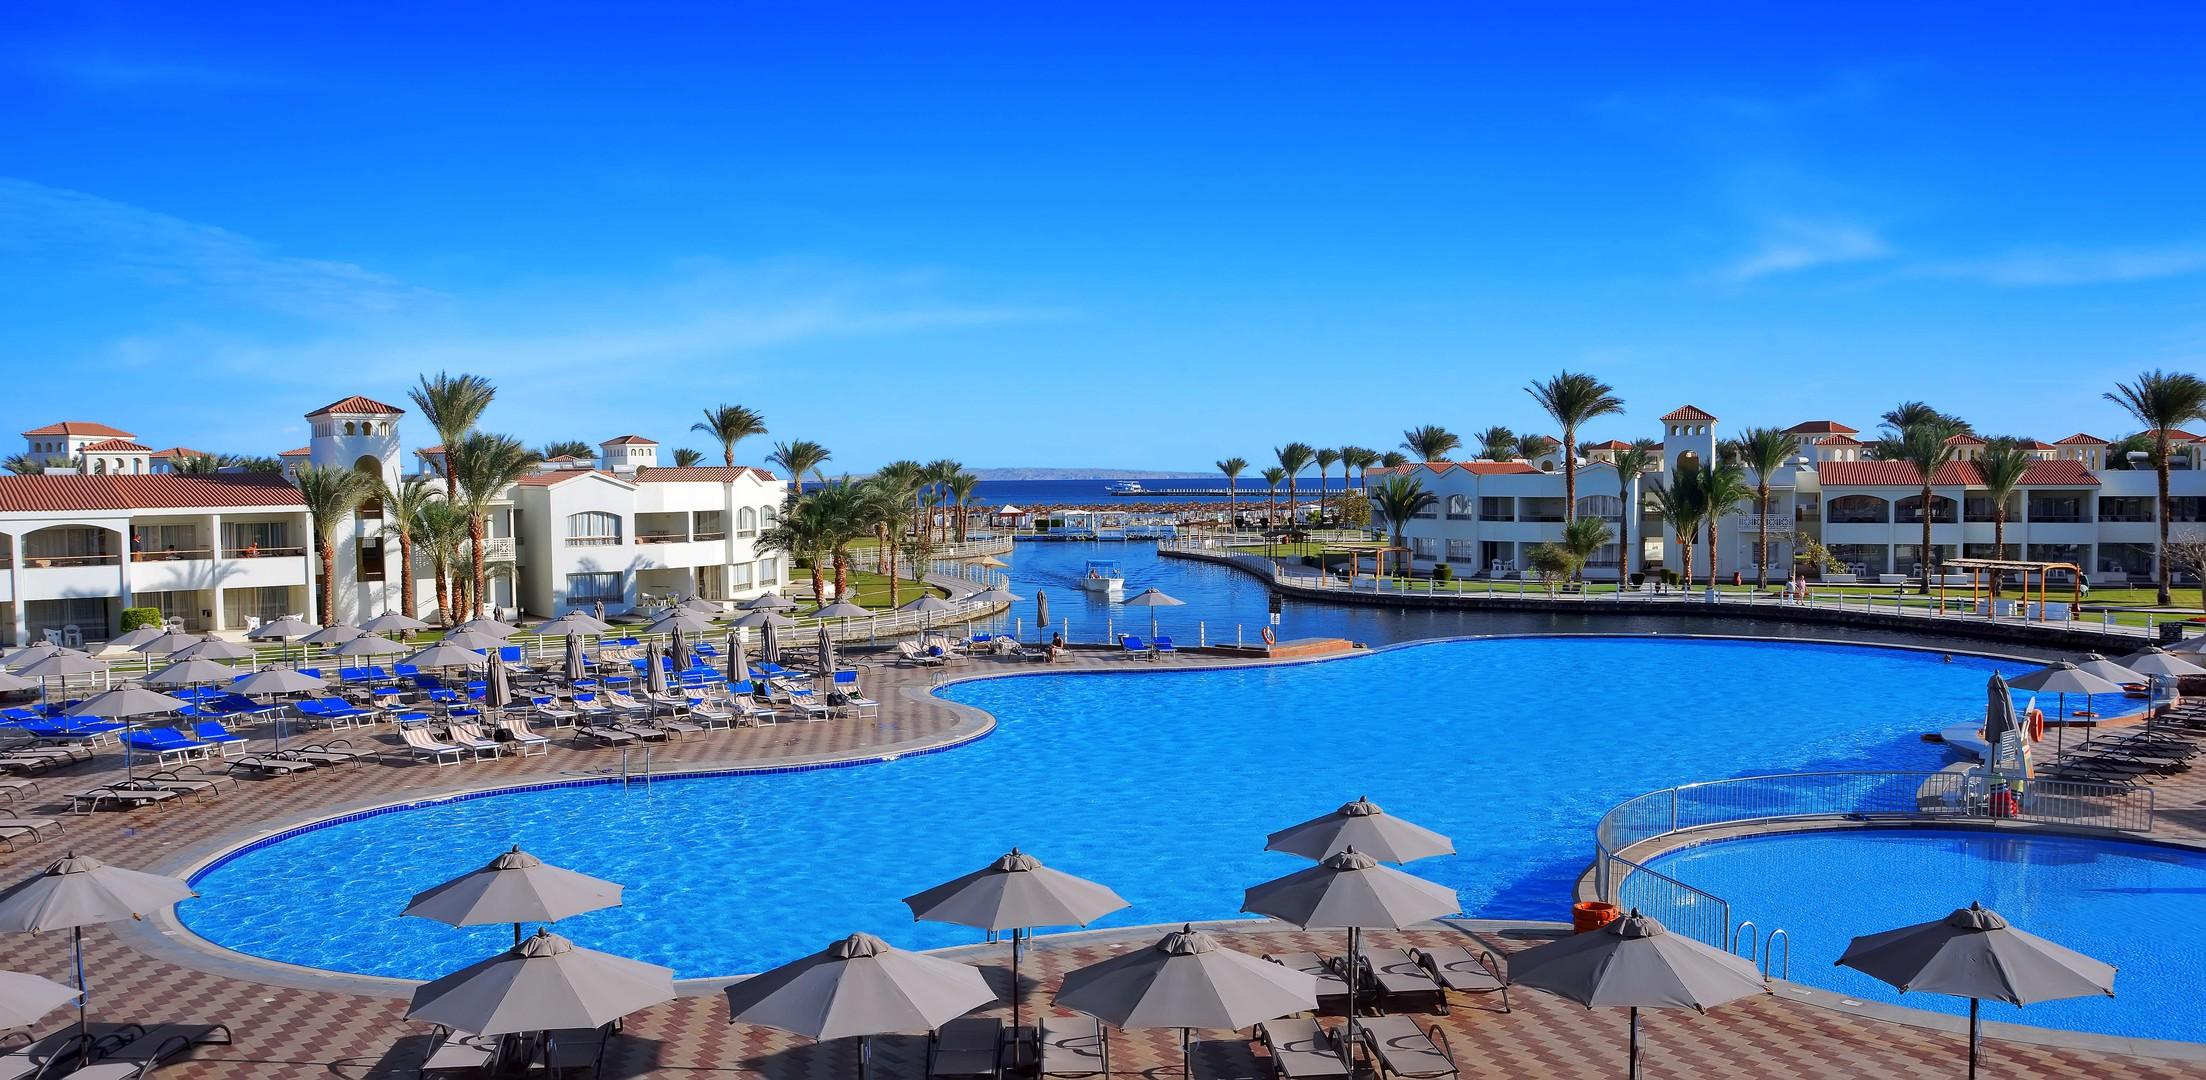 Hotel Pickalbatros - Dana Beach Resort